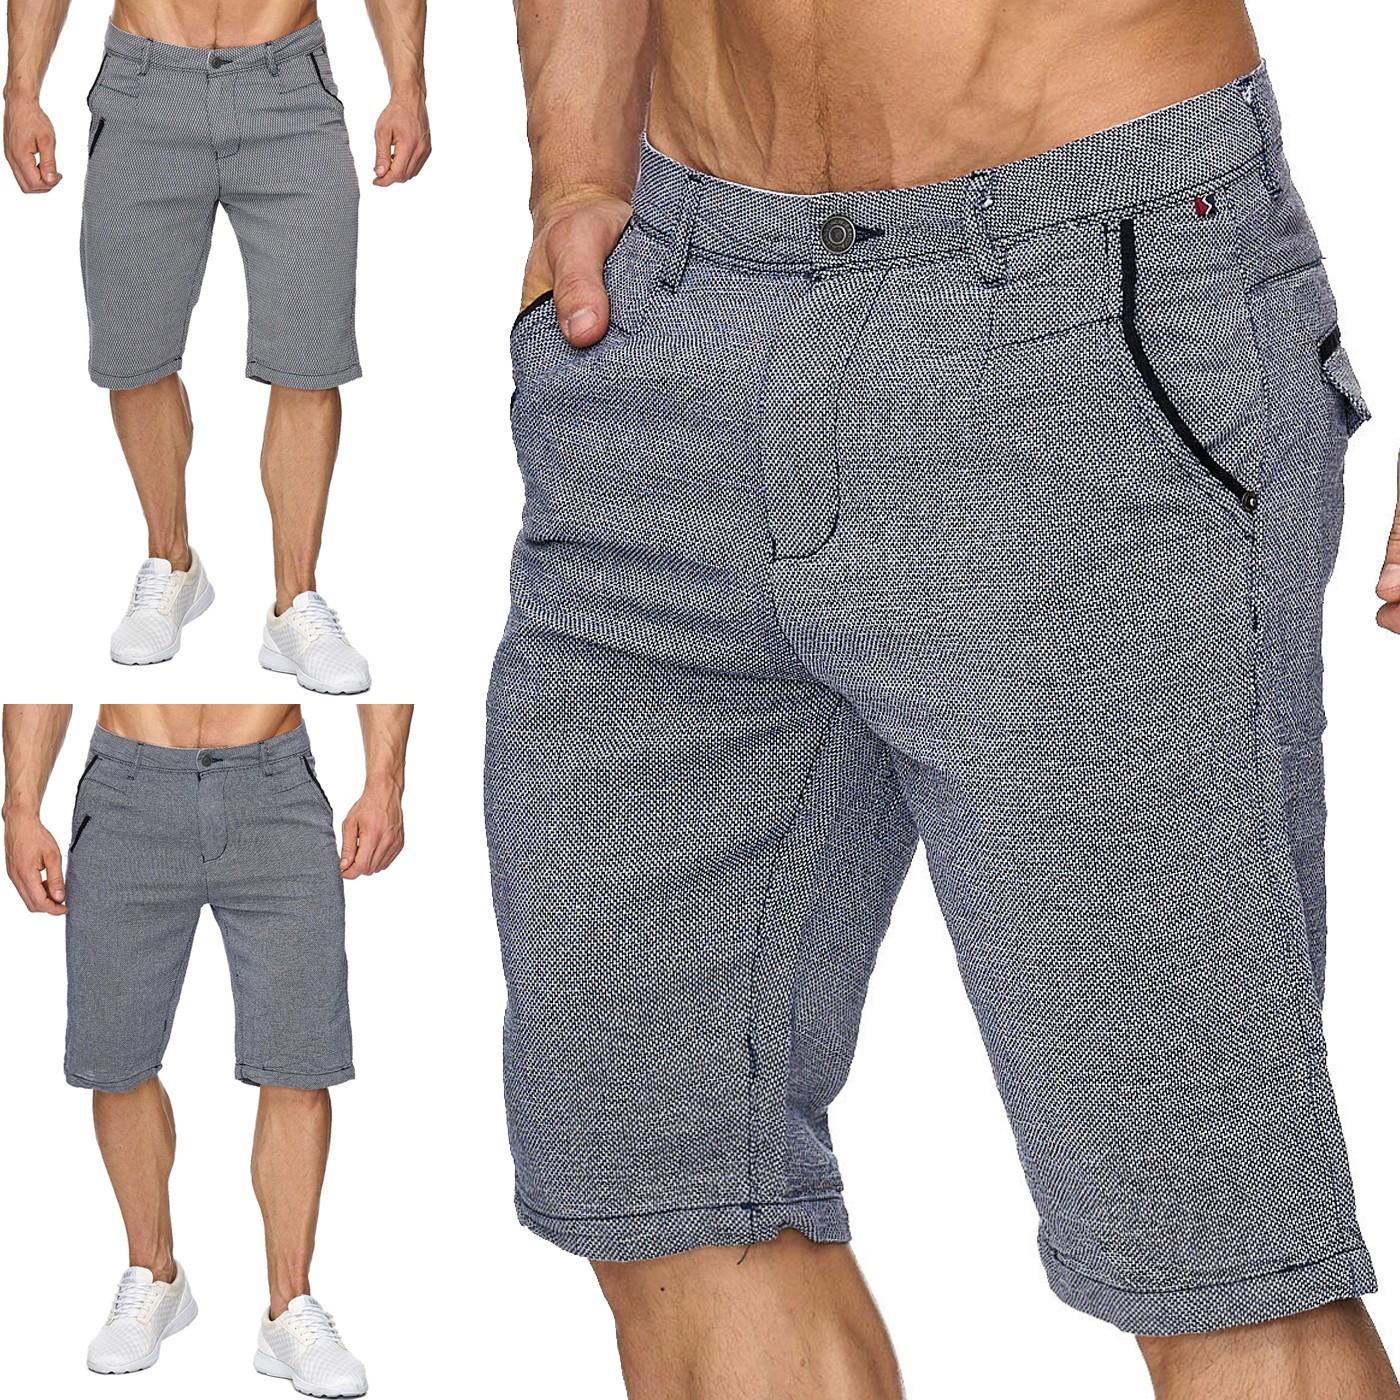 Herren Bermuda Shorts Kurze Chino Hose Capri Walkshort H1443, Farben:Blau, Größe Shorts:W33